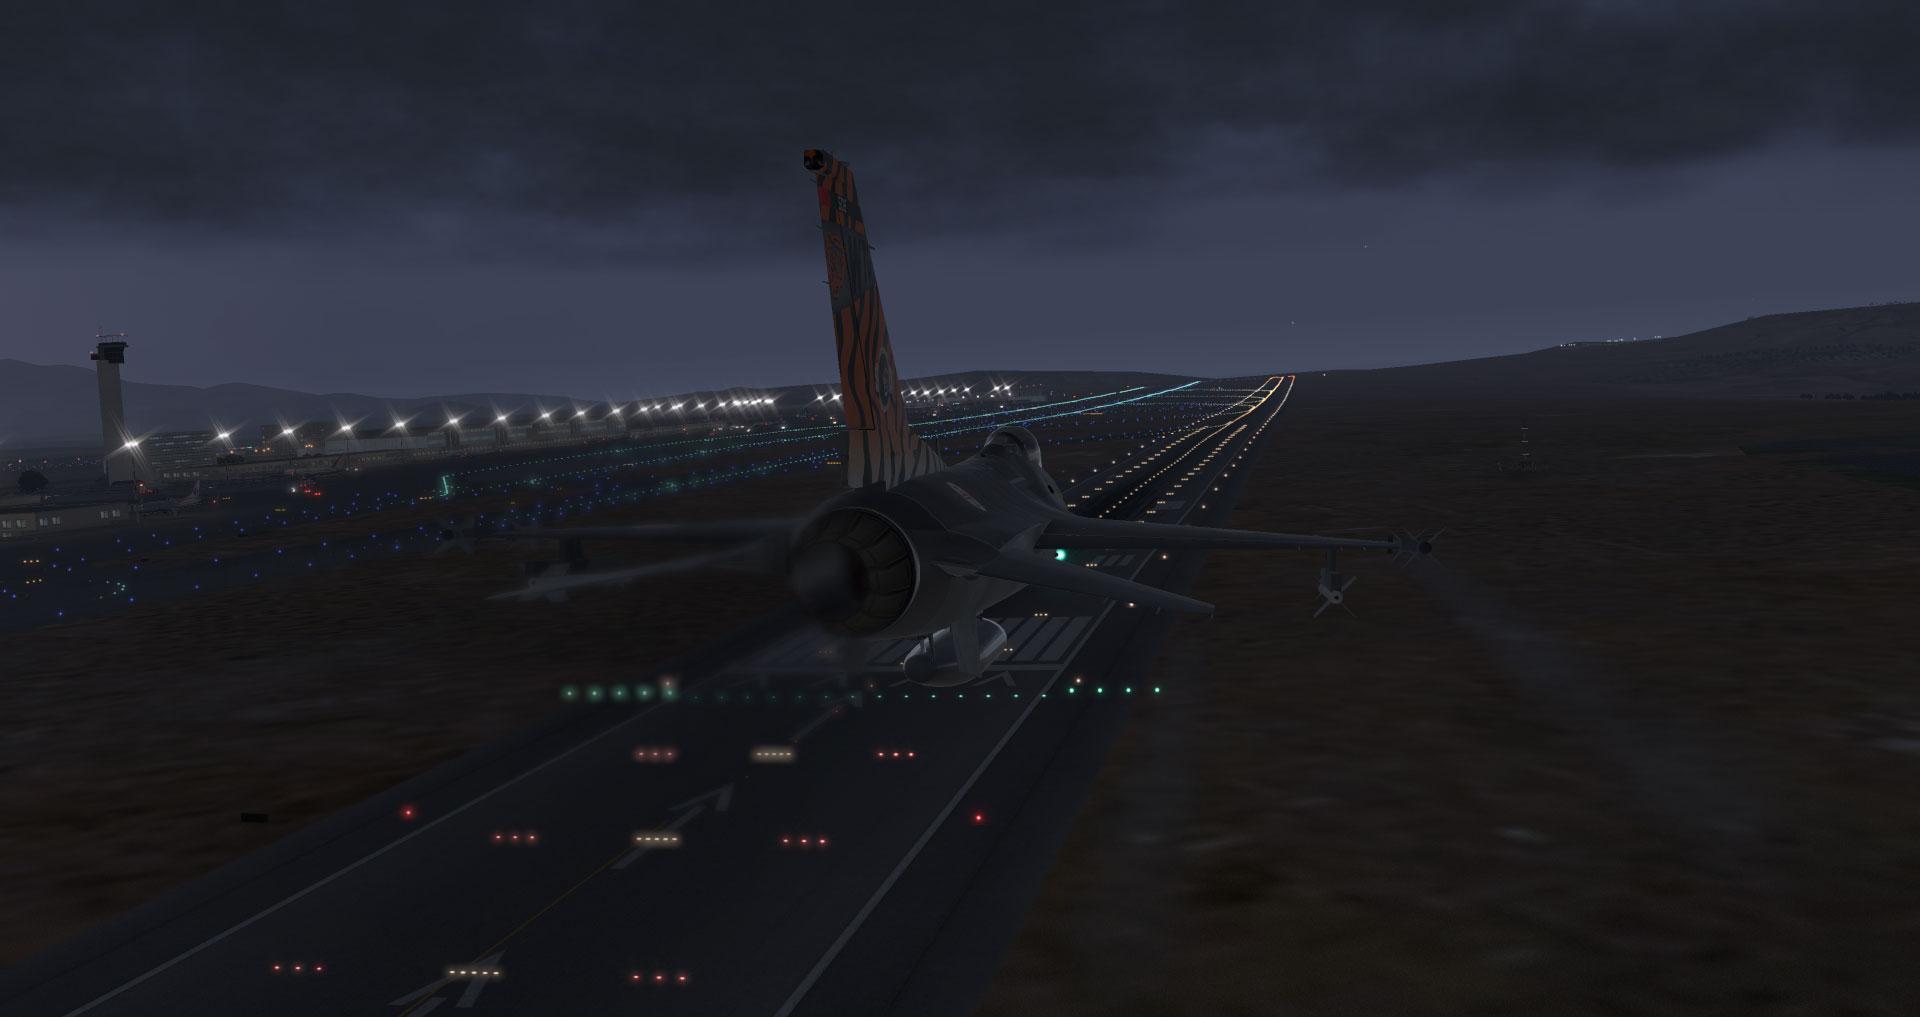 F_16---2021-03-21-16.57